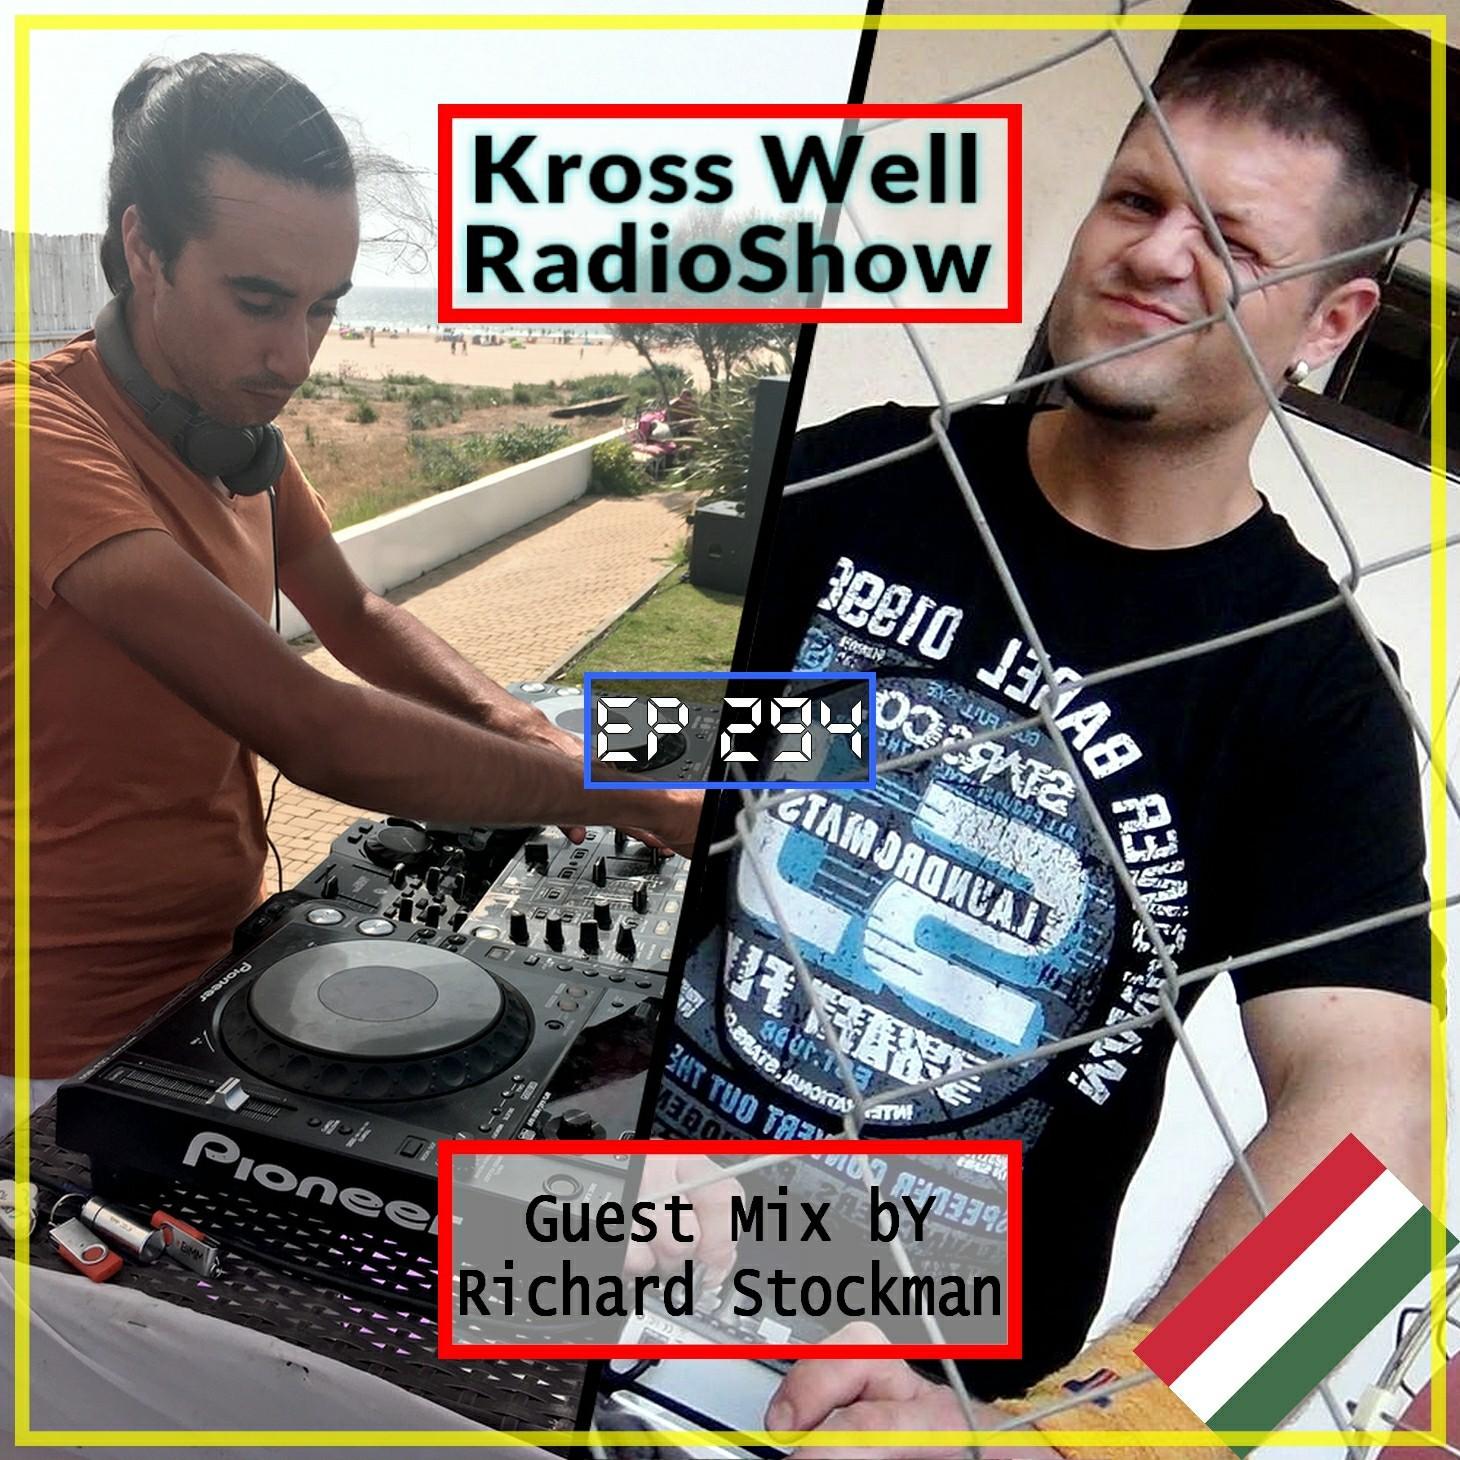 Kross Well RadioShow [Guest Mix by Richard Stockman] #294